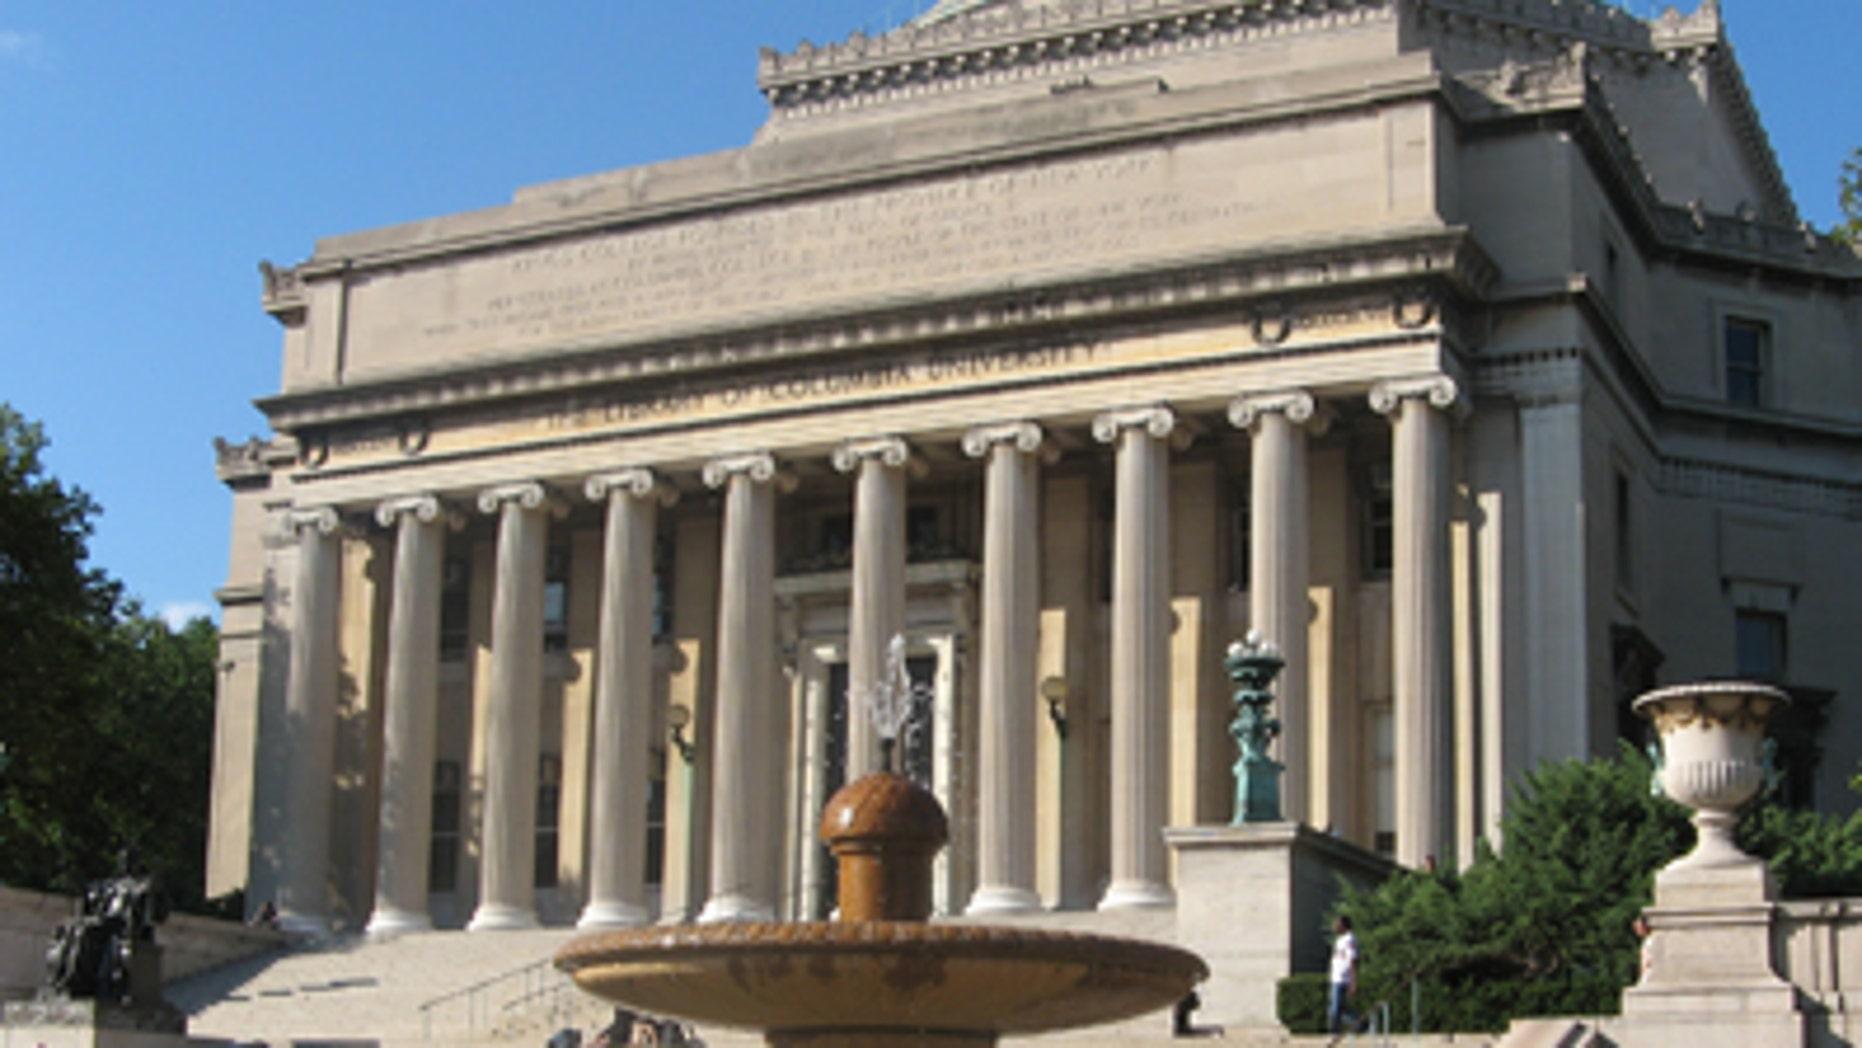 Columbia University's Low Library in New York, N.Y.